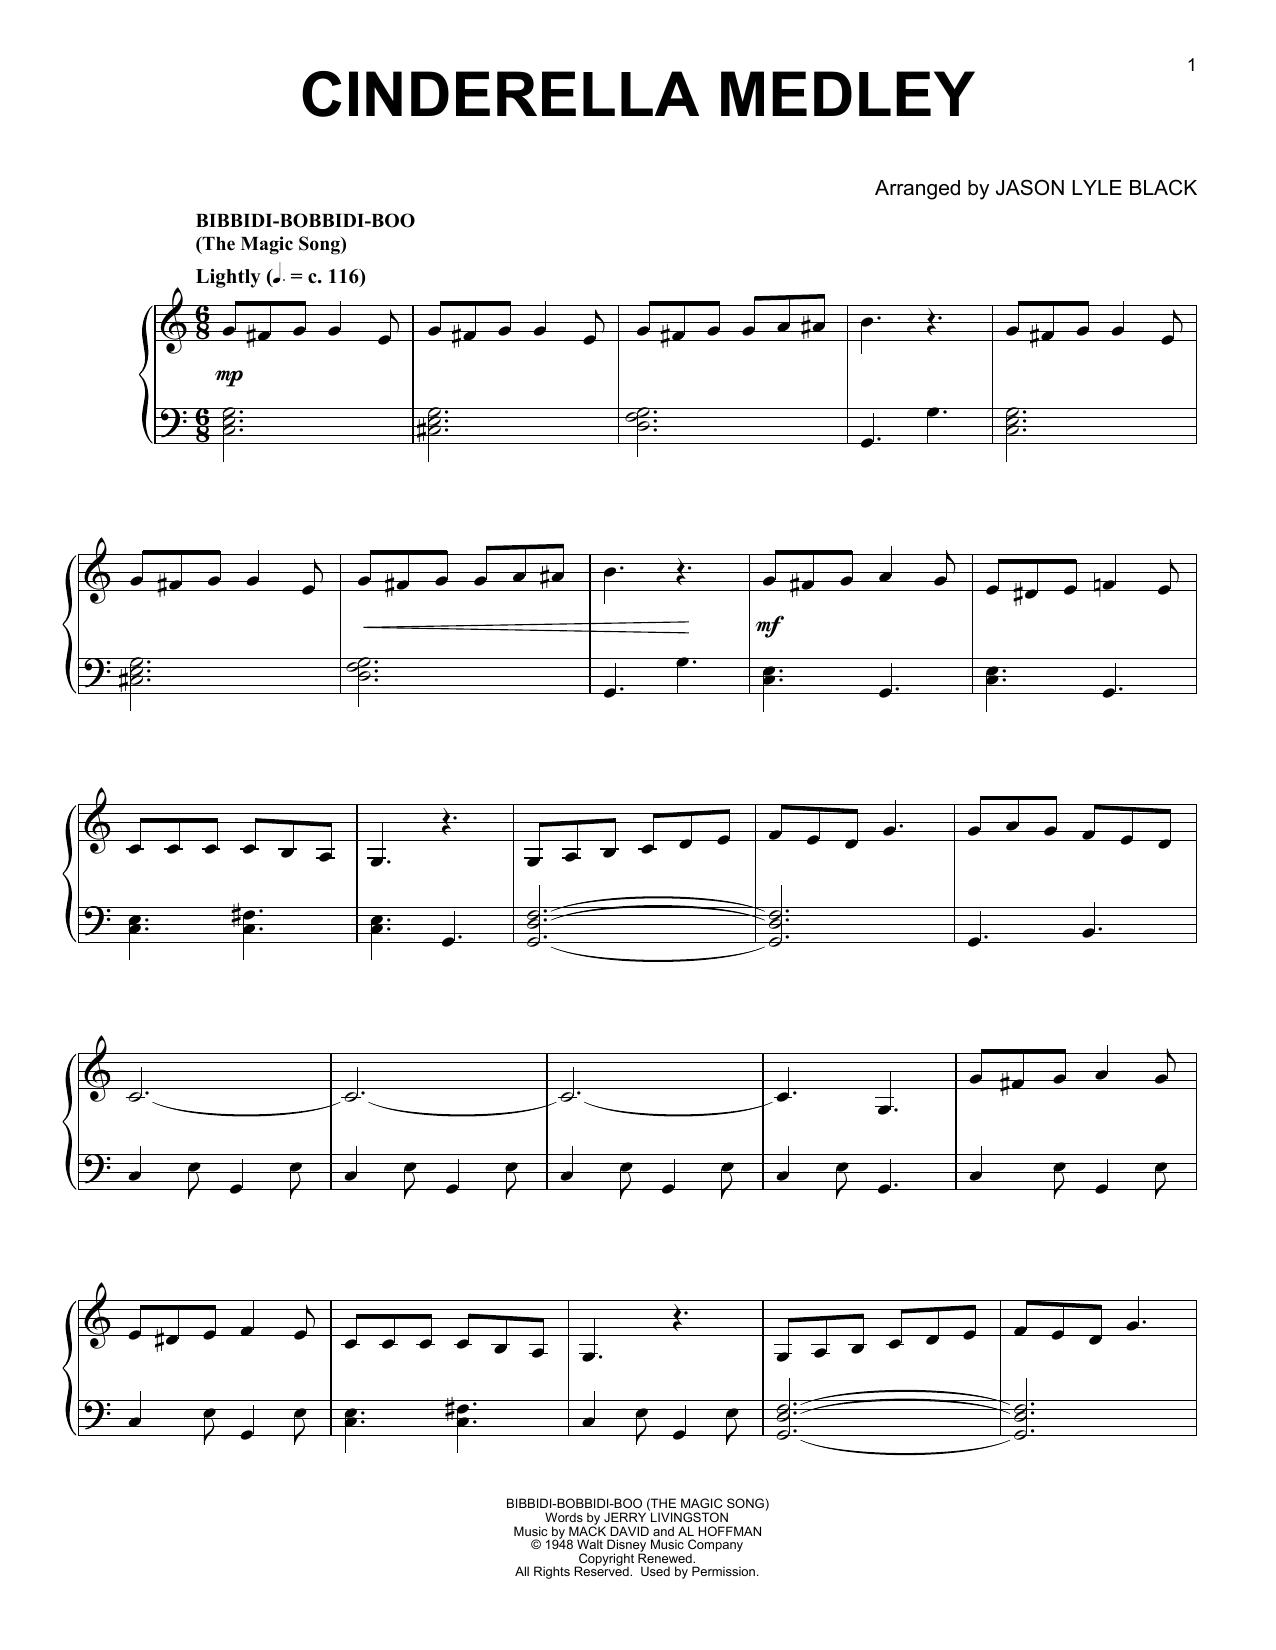 Mack David, Al Hoffman and Jerry Livingston Cinderella Medley (arr. Jason Lyle Black) sheet music notes and chords. Download Printable PDF.